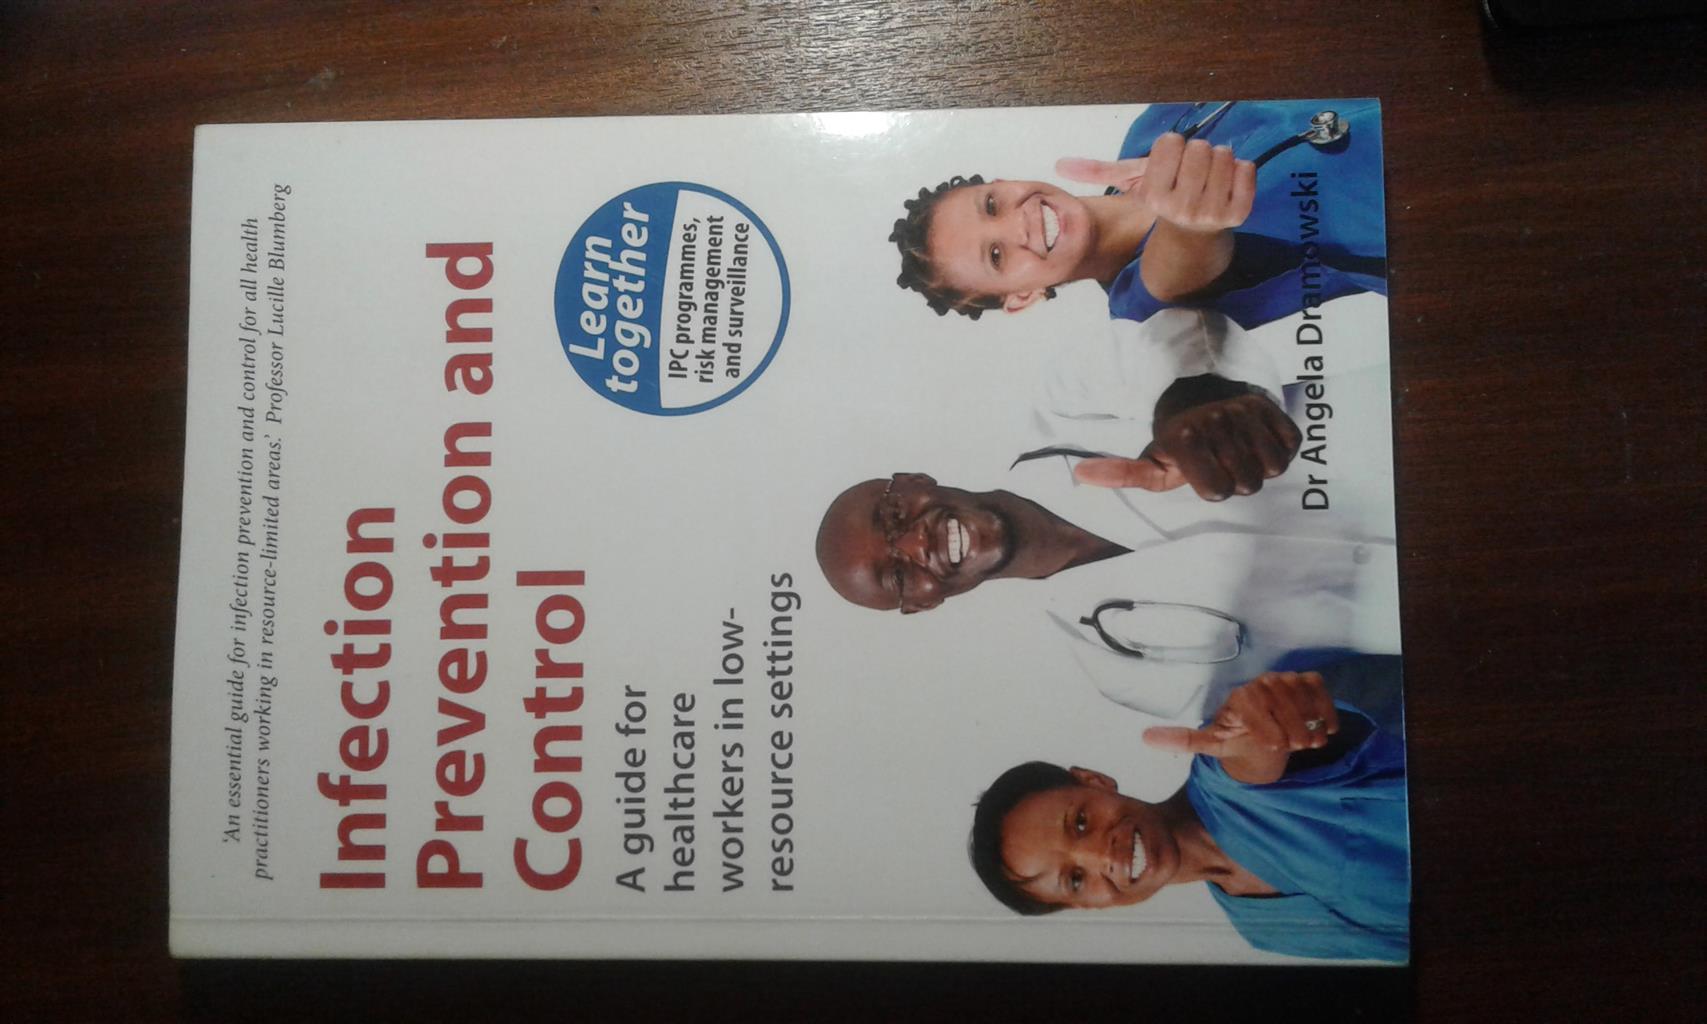 ODA / Medical Textbooks for sale